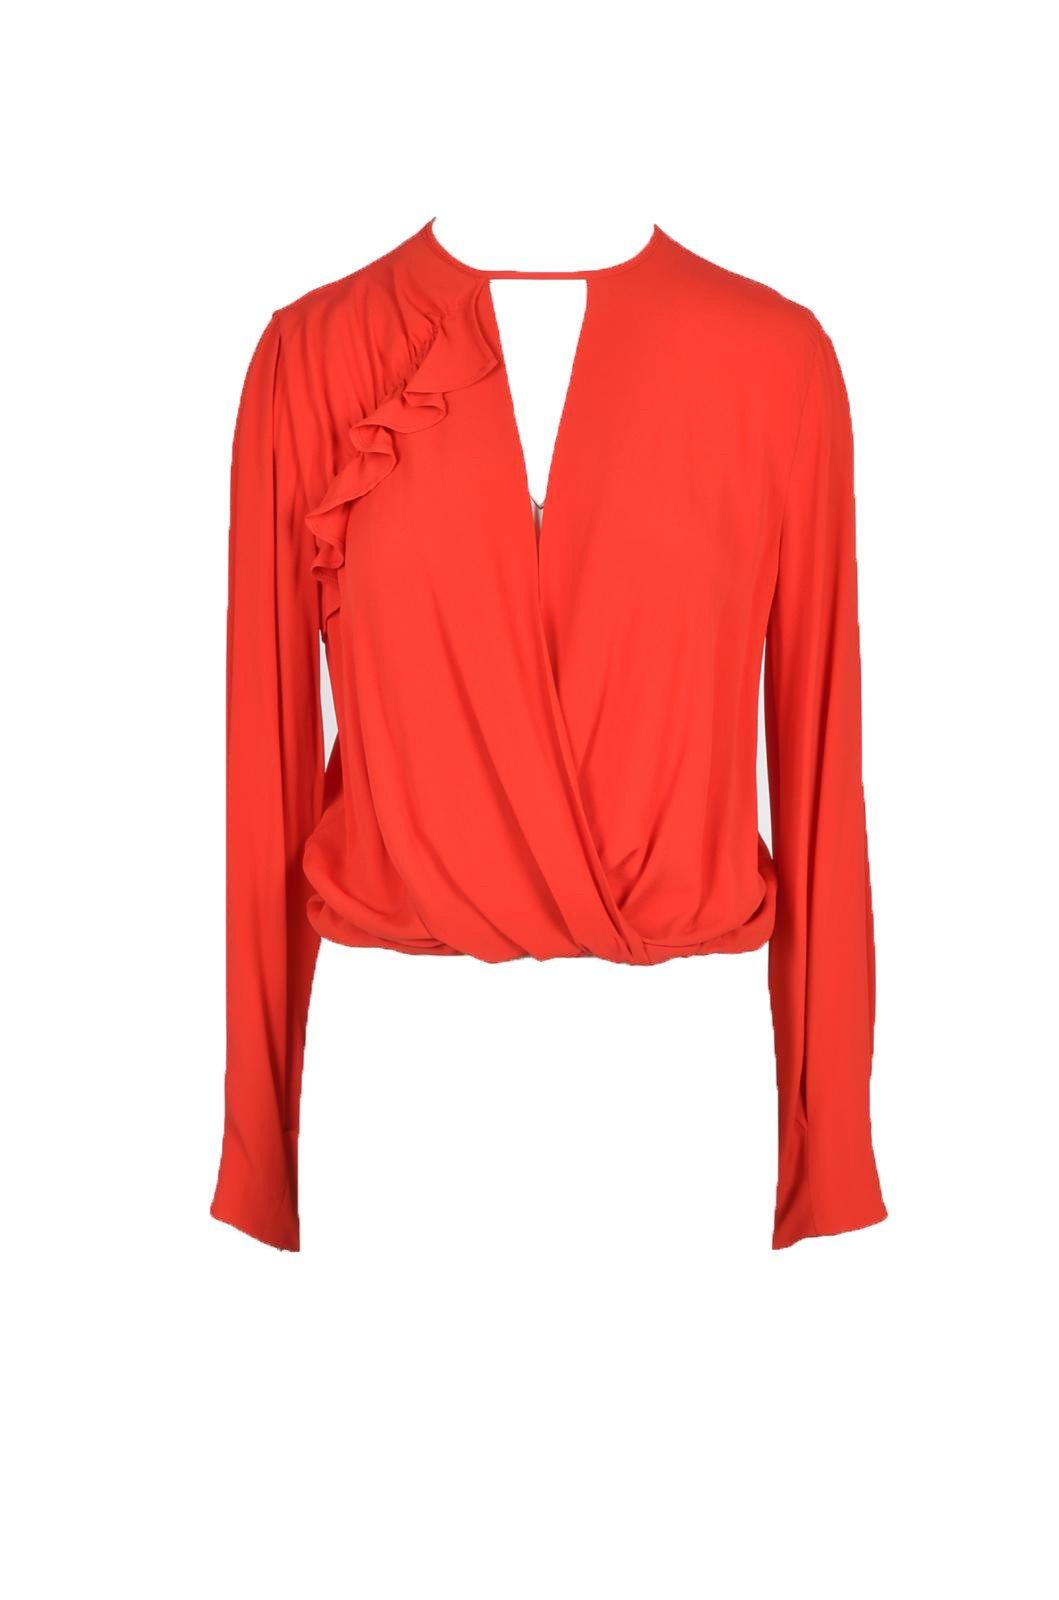 Pinko Women's T-Shirt Multicolor 263155 - red 40